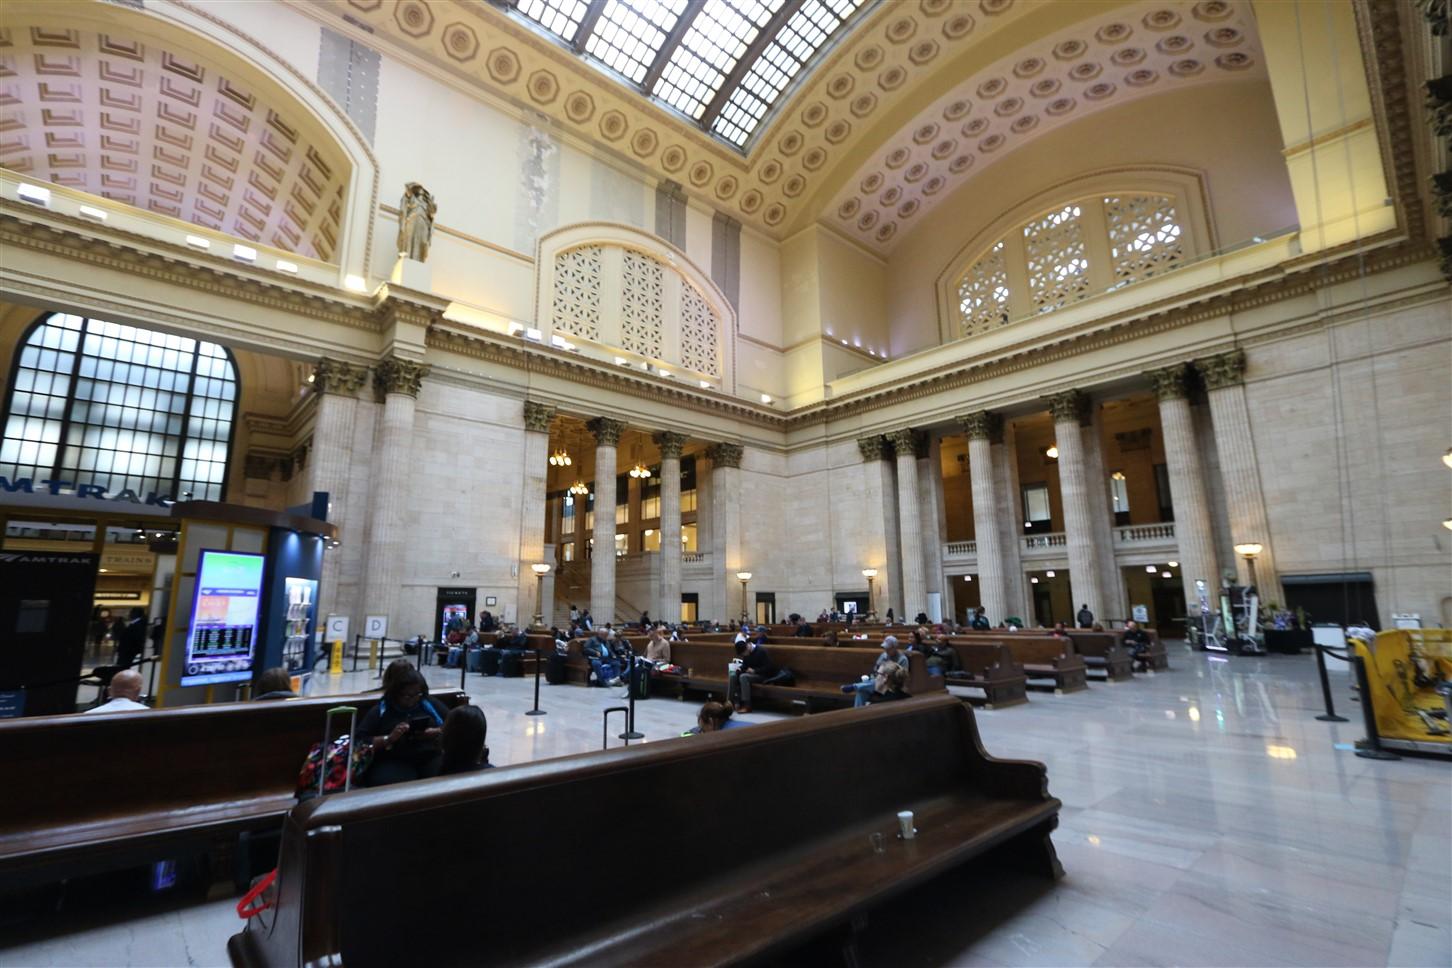 2017 10 15 401 Chicago Open House - Union Station.jpg